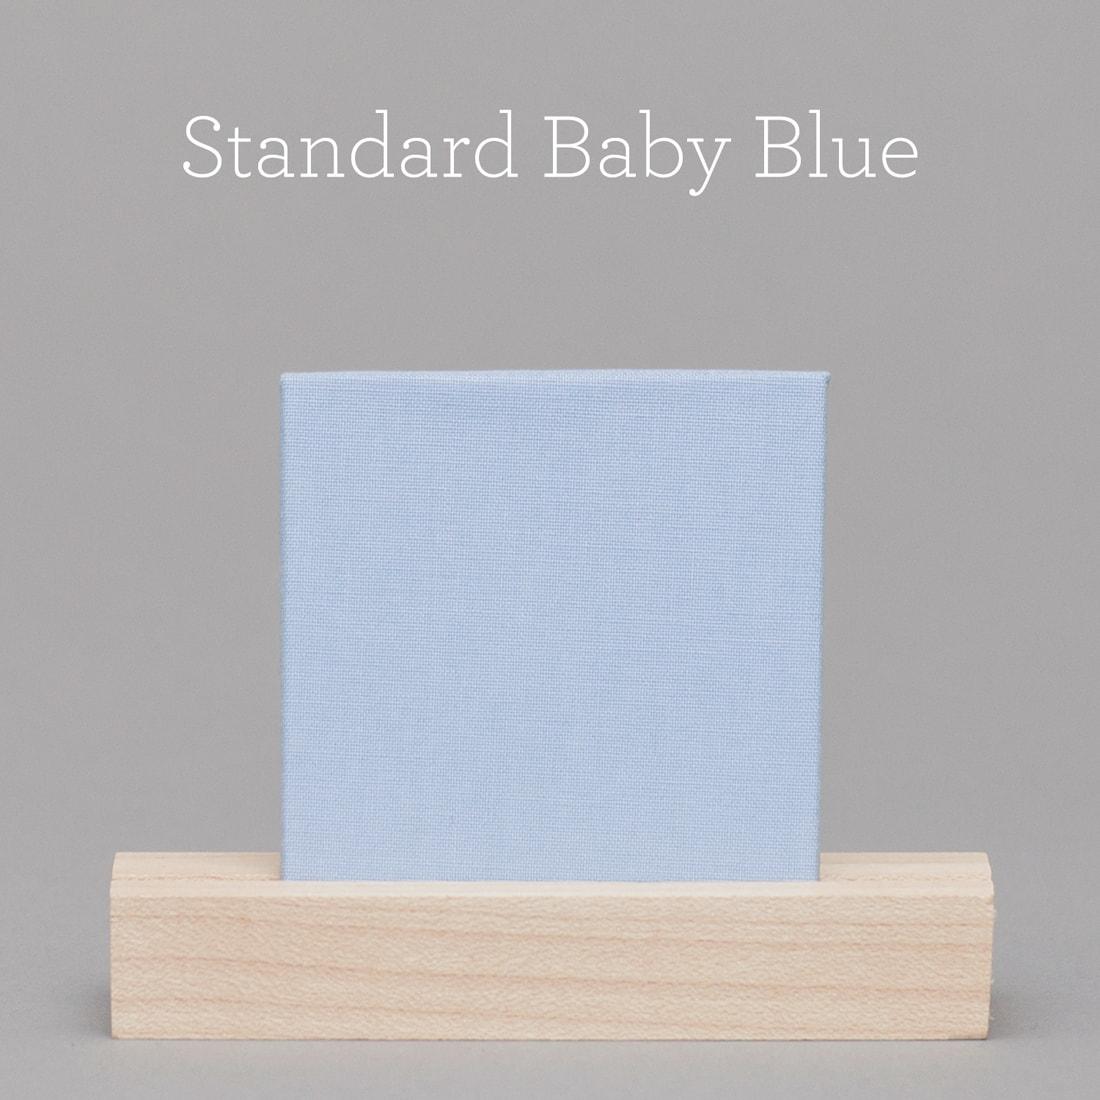 StandardBabyBlue